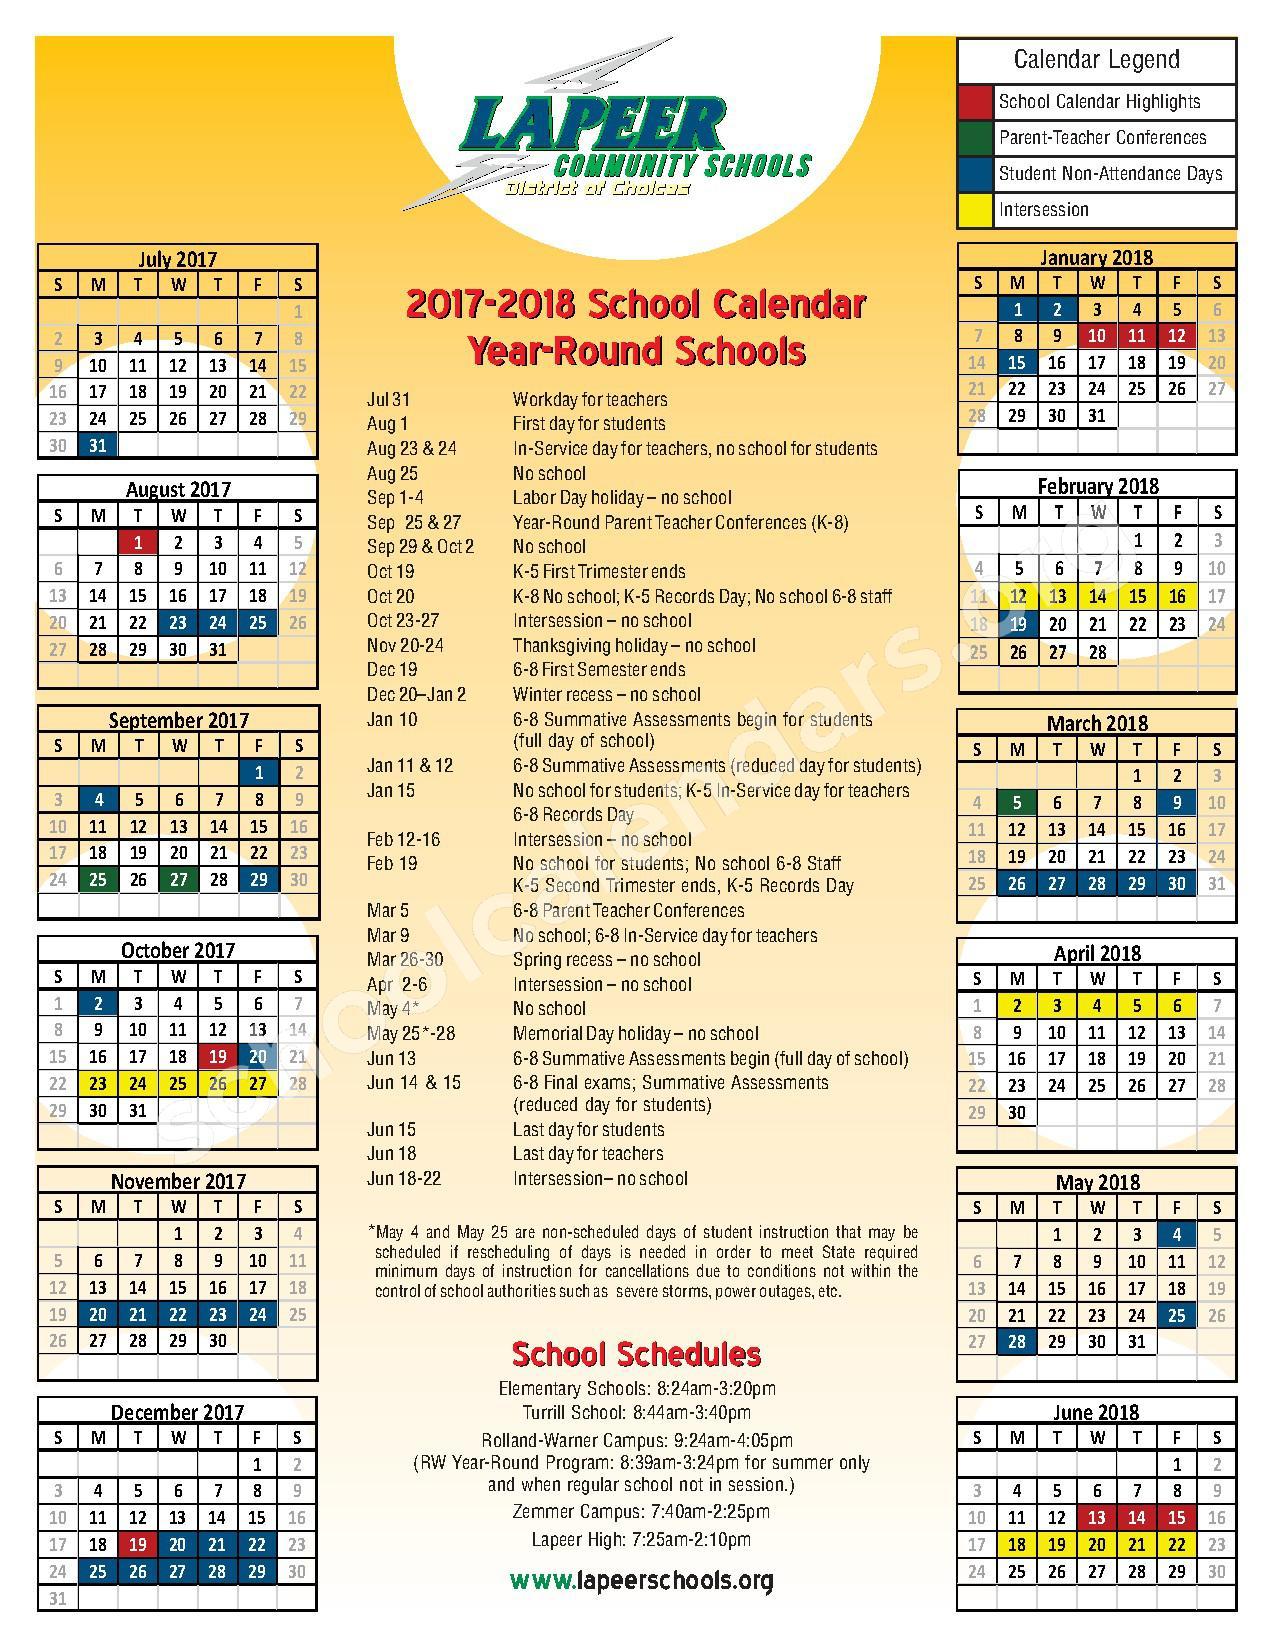 2017 - 2018 Year-Round School Calendar – Lapeer Community Schools – page 1